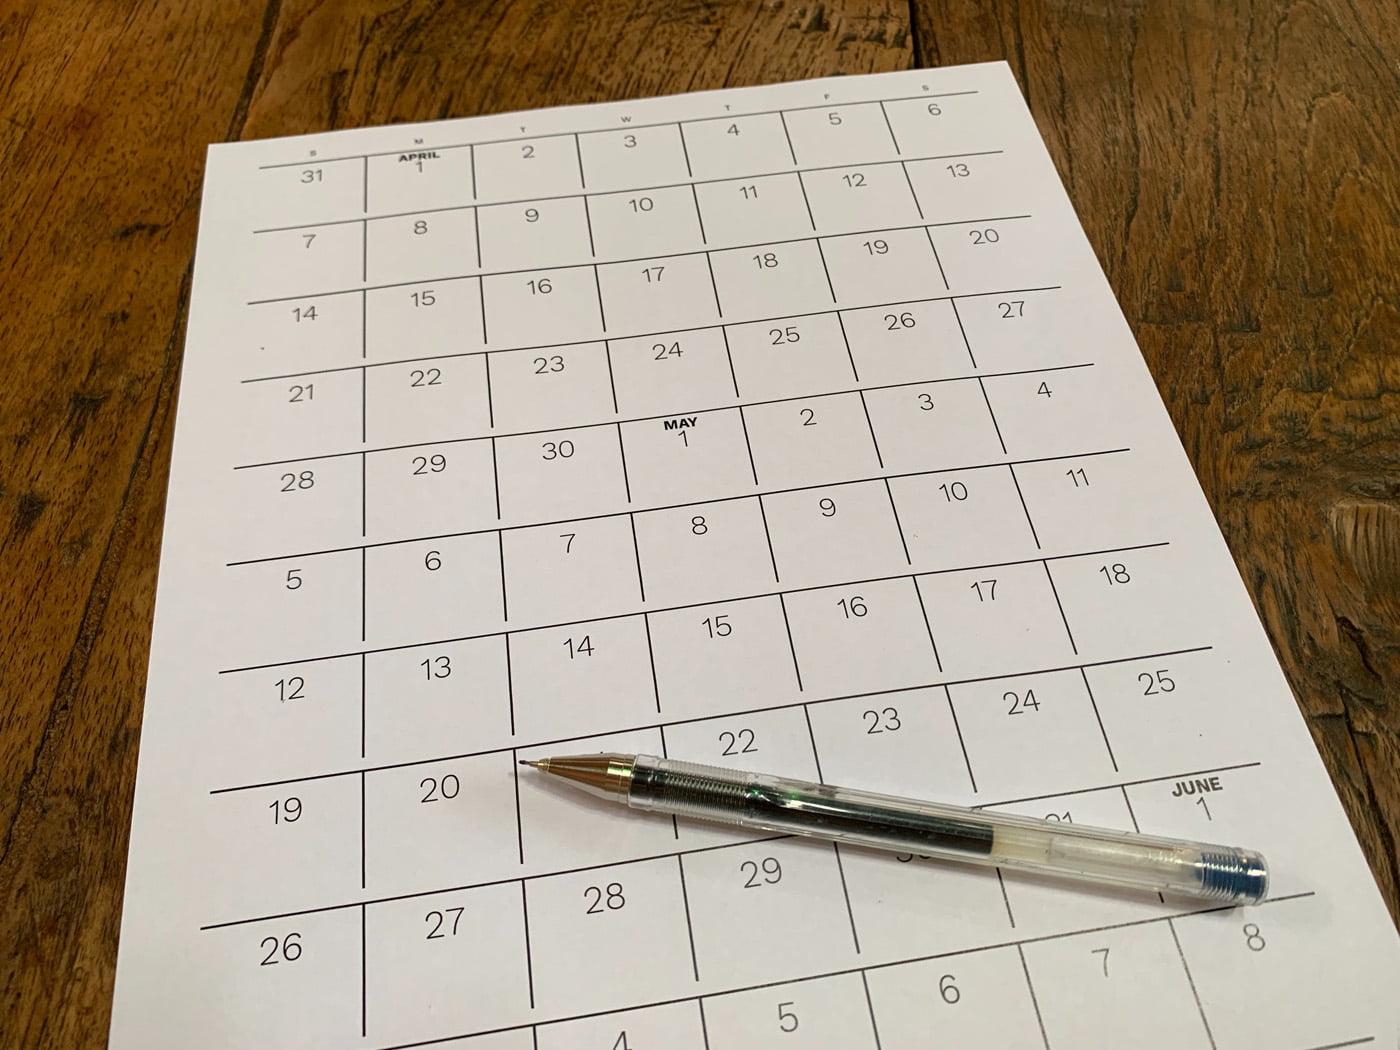 calendar-generator-calendrier-imprime Calendar Generator permet de générer des calendriers à imprimer